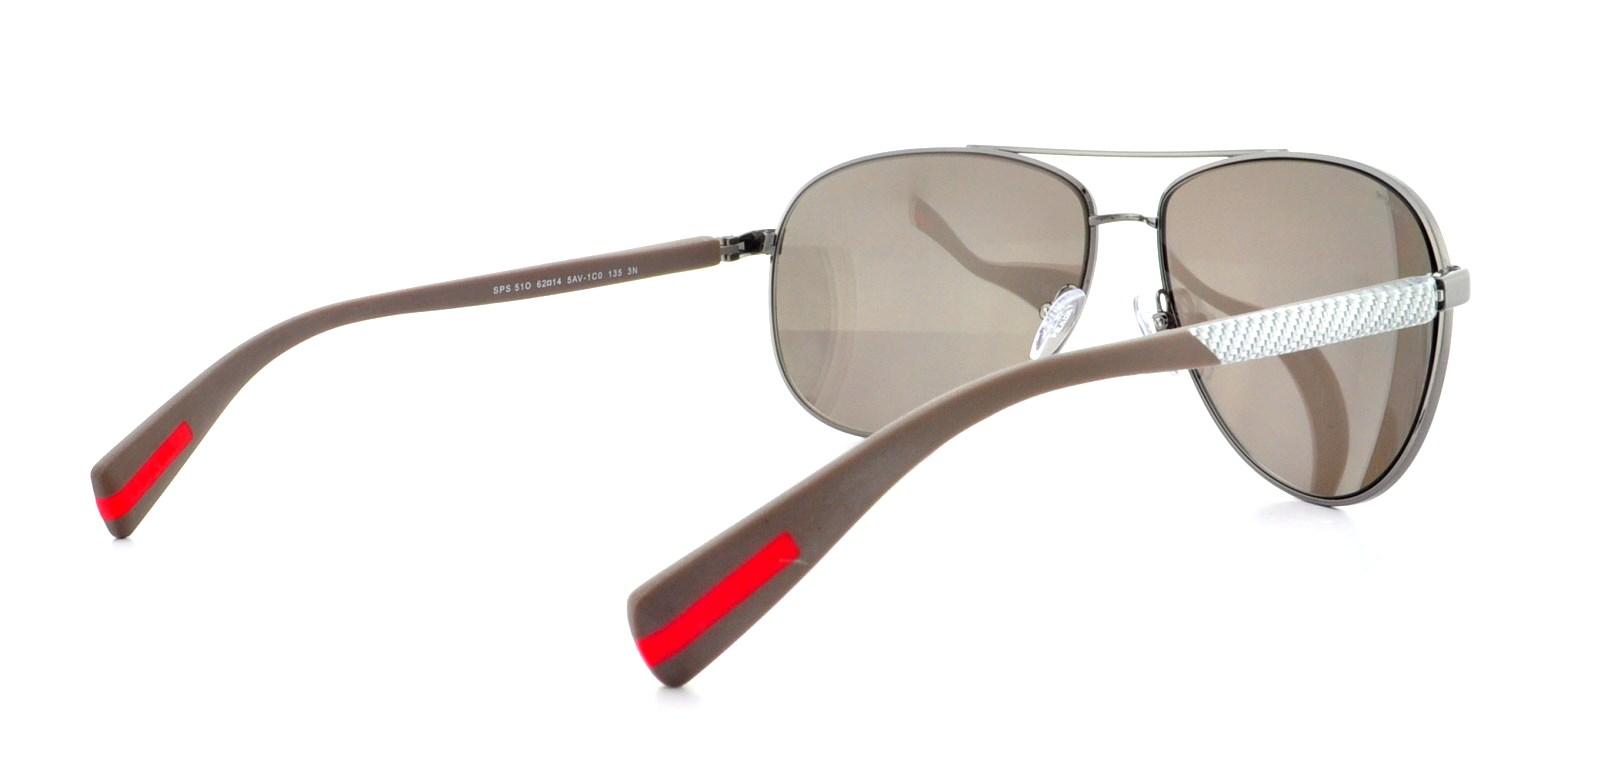 baf3c9a2ad8 PRADA SPORT Sunglasses PS51OS NETEX COLLECTION 5AV1C0 Gunmetal 62MM ...